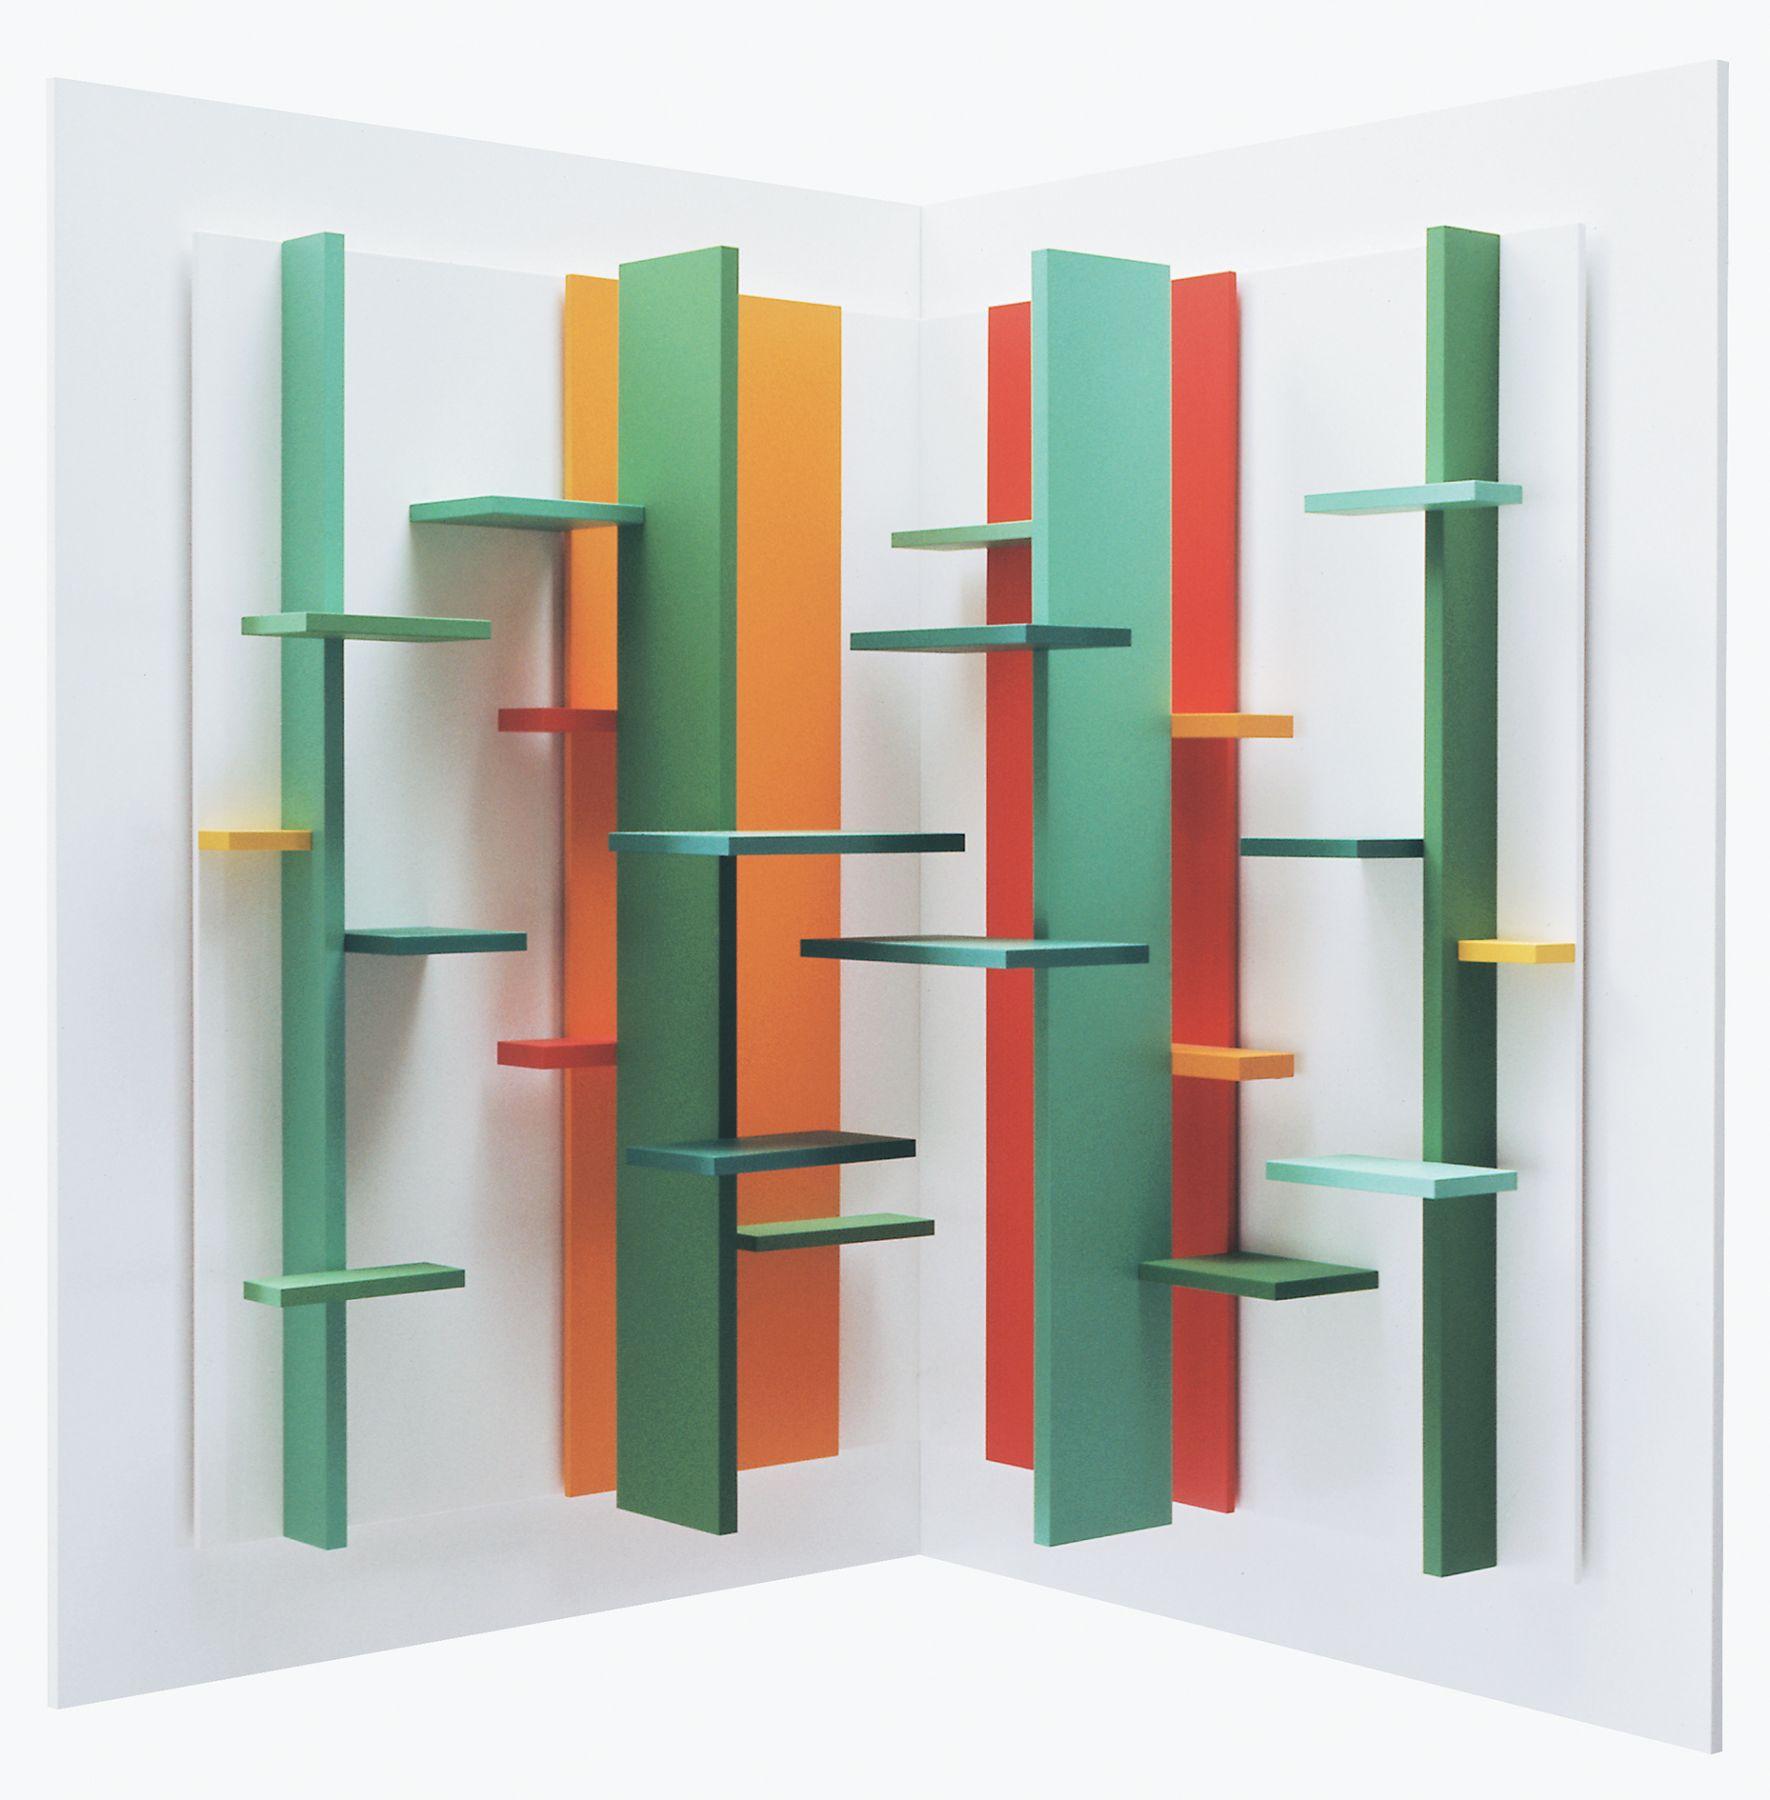 Eli Bornstein, Double Plane Structurist Relief No.2-I, 1966-71, enamel on plexiglass and aluminum, 17 x 17 x 9 1/4 inches